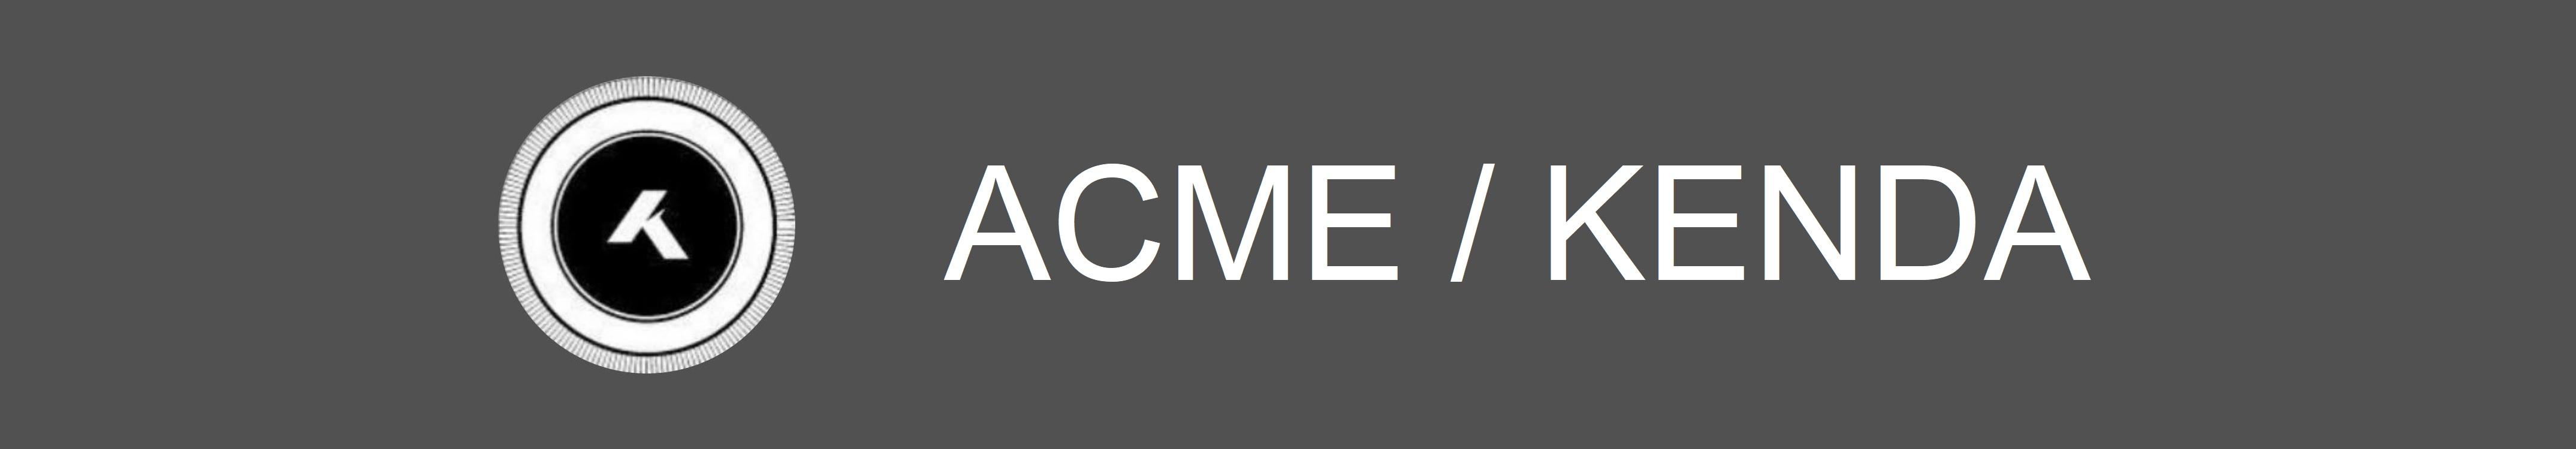 ACME-KENDA